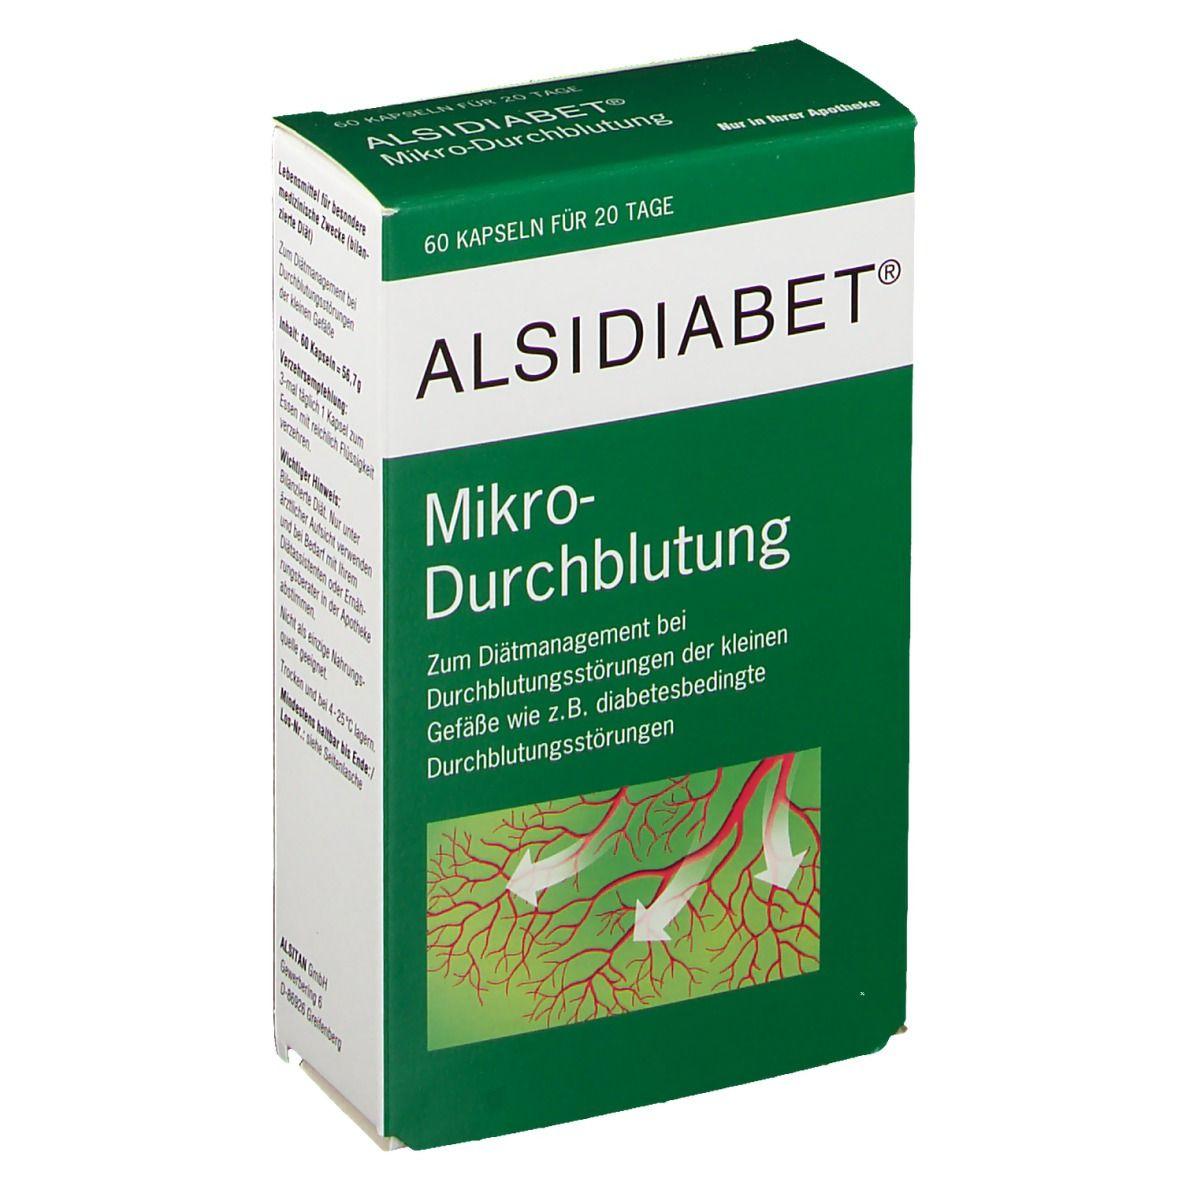 Image of Alsidiabet® Mikro-Durchblutung